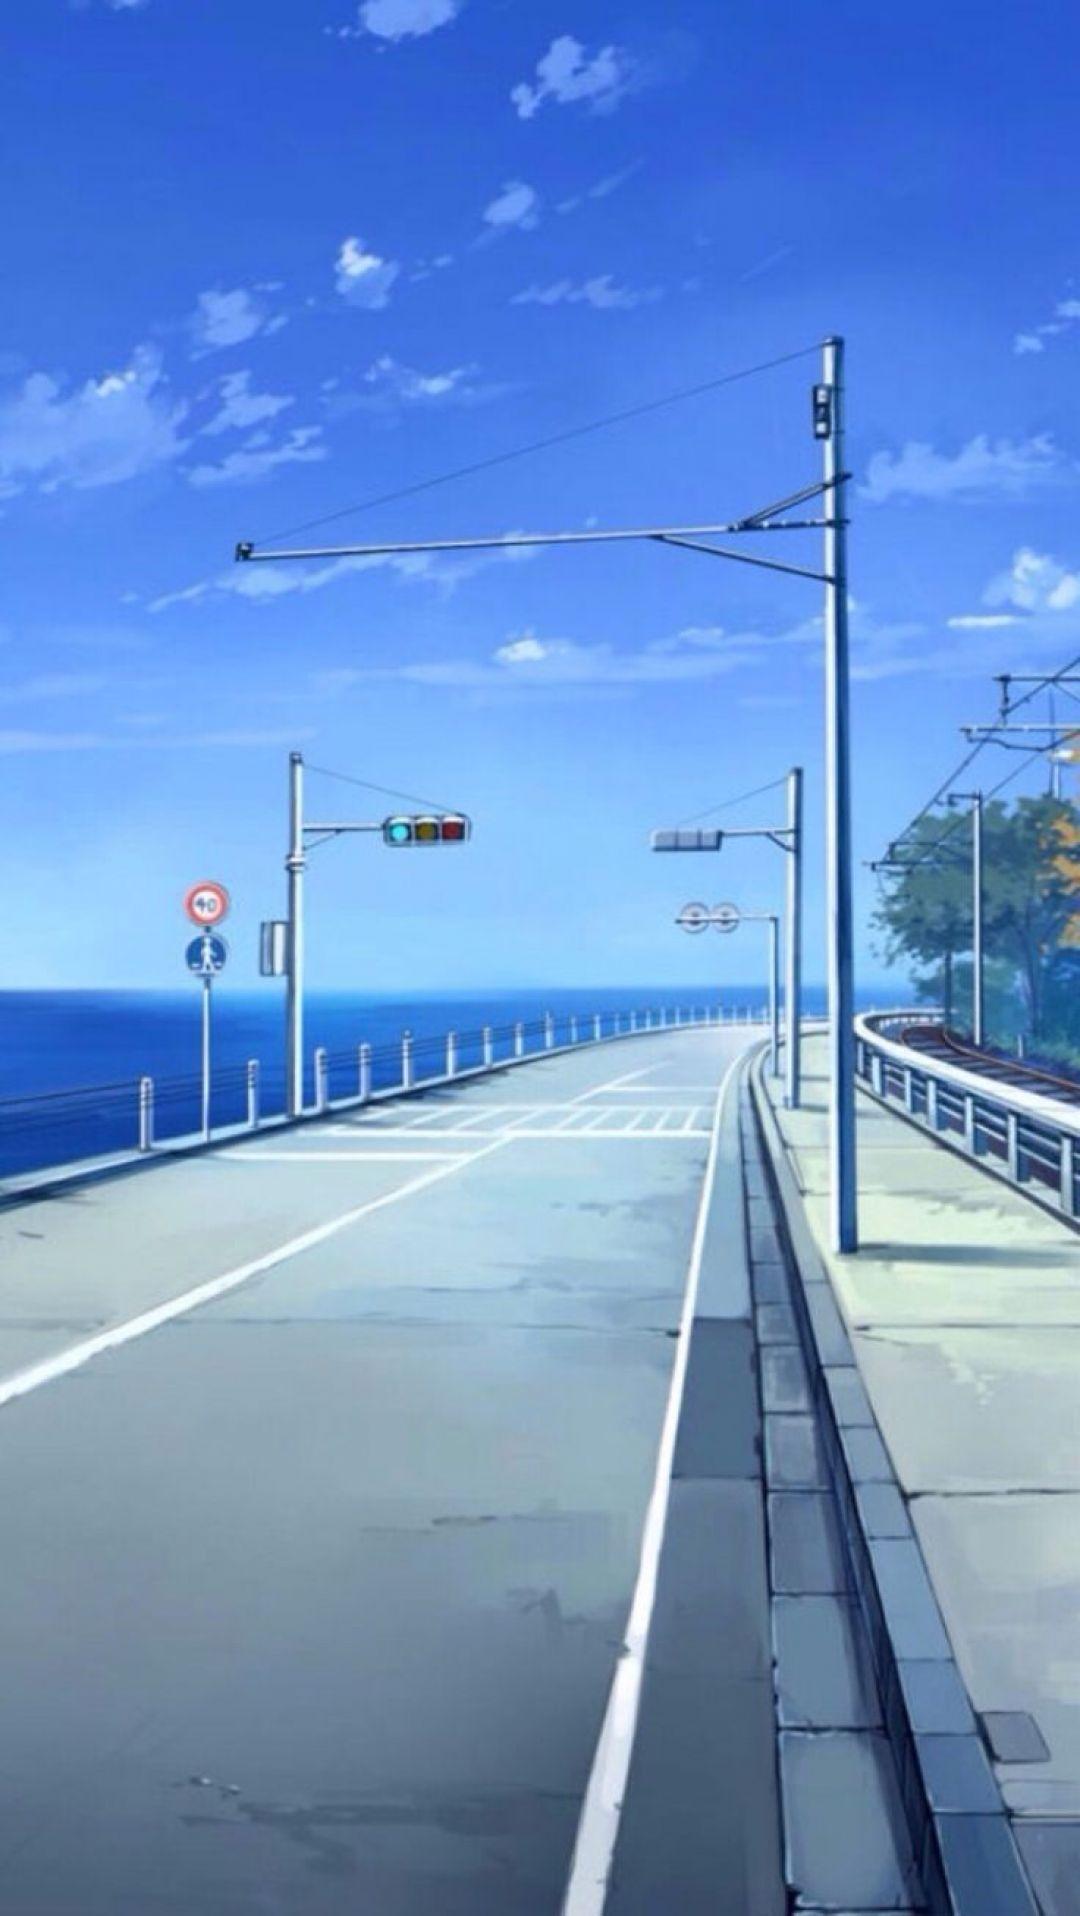 Pastel Aesthetic Anime Hd Wallpapers 1080p 4k 34815 1080x1916 Download Hd Wallpaper Wallpapertip